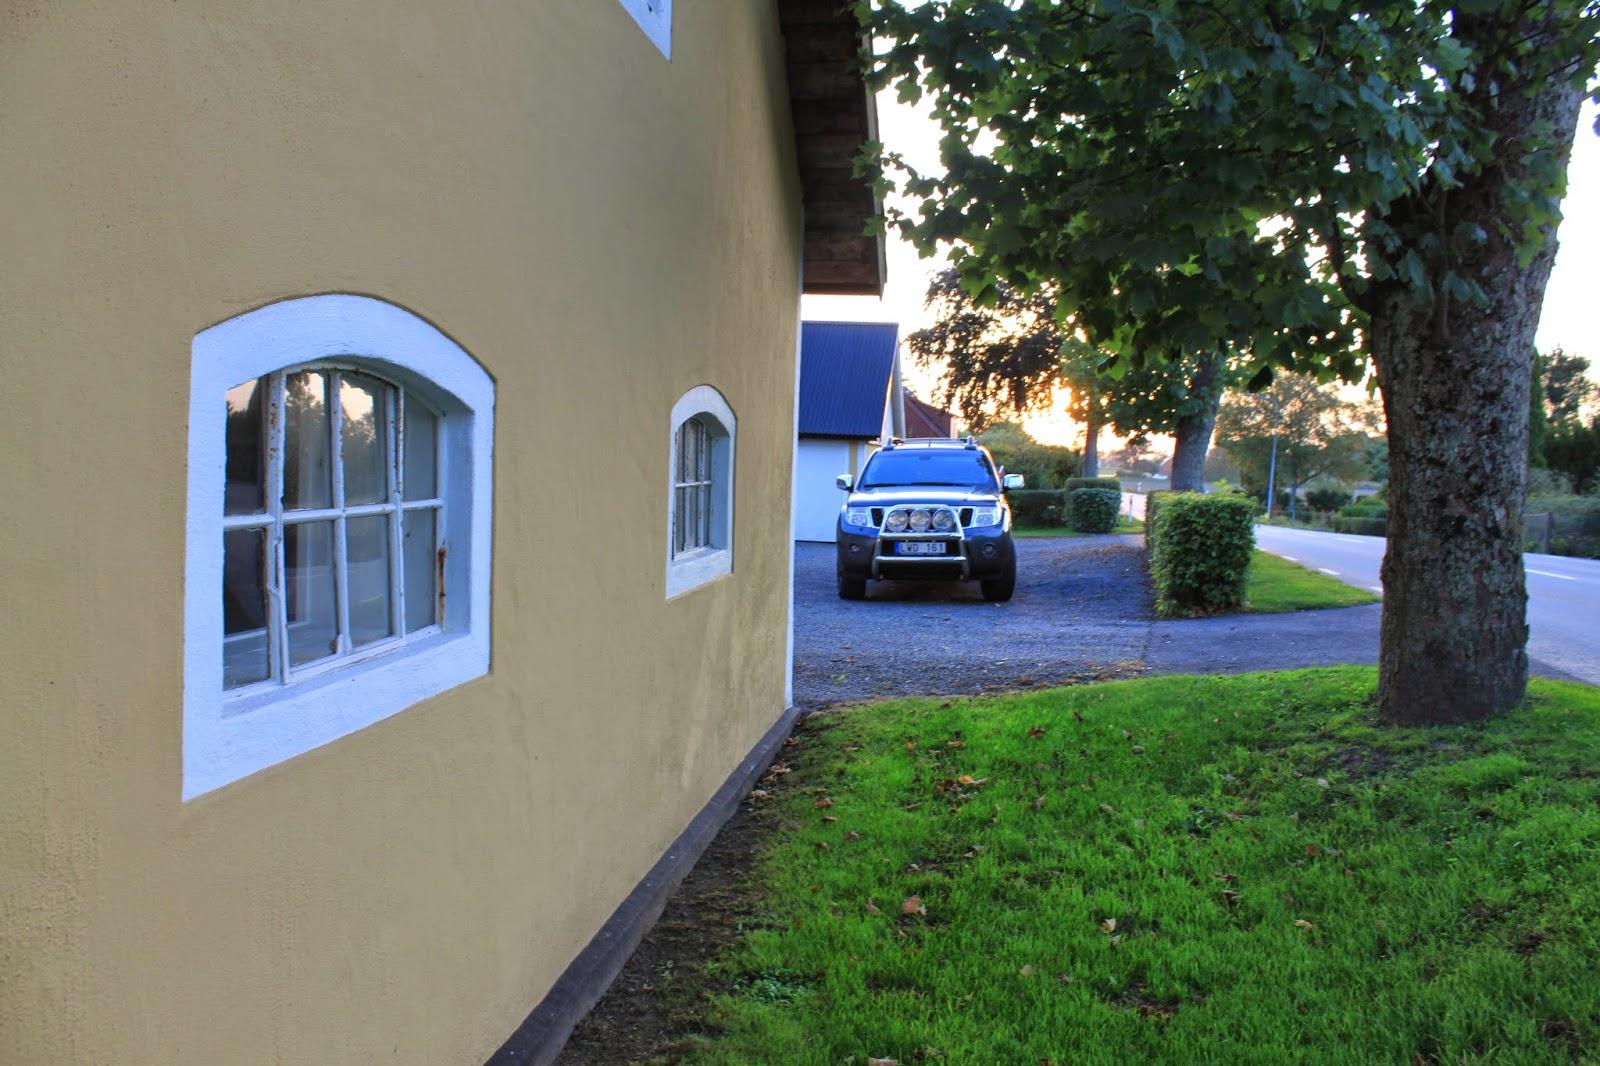 Sanna maries trädgårdsrum: september 2014